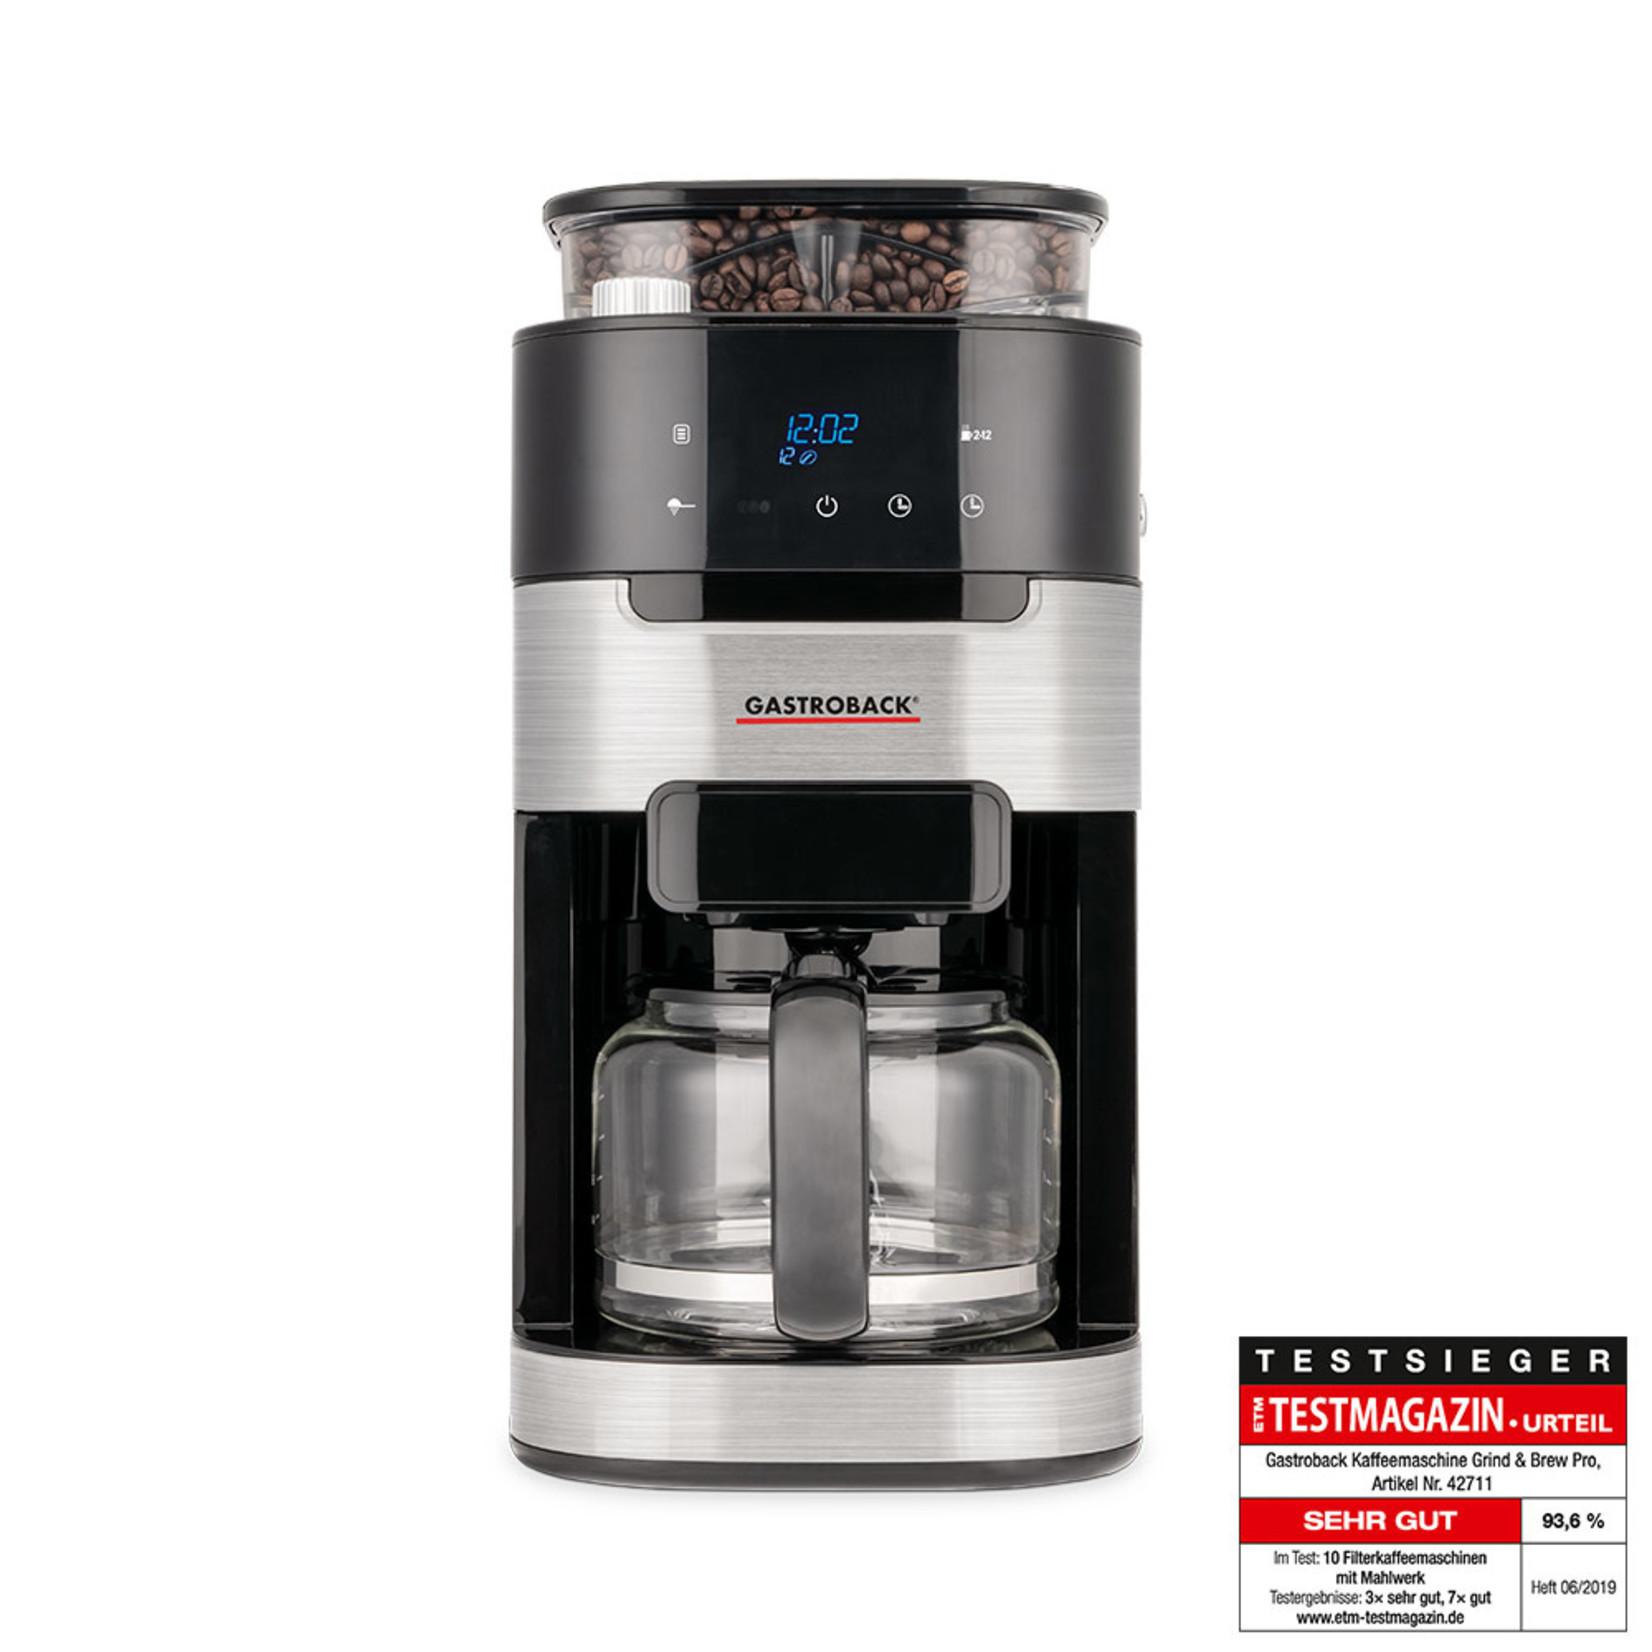 Gastroback Gastroback koffiezetapparaat 42711